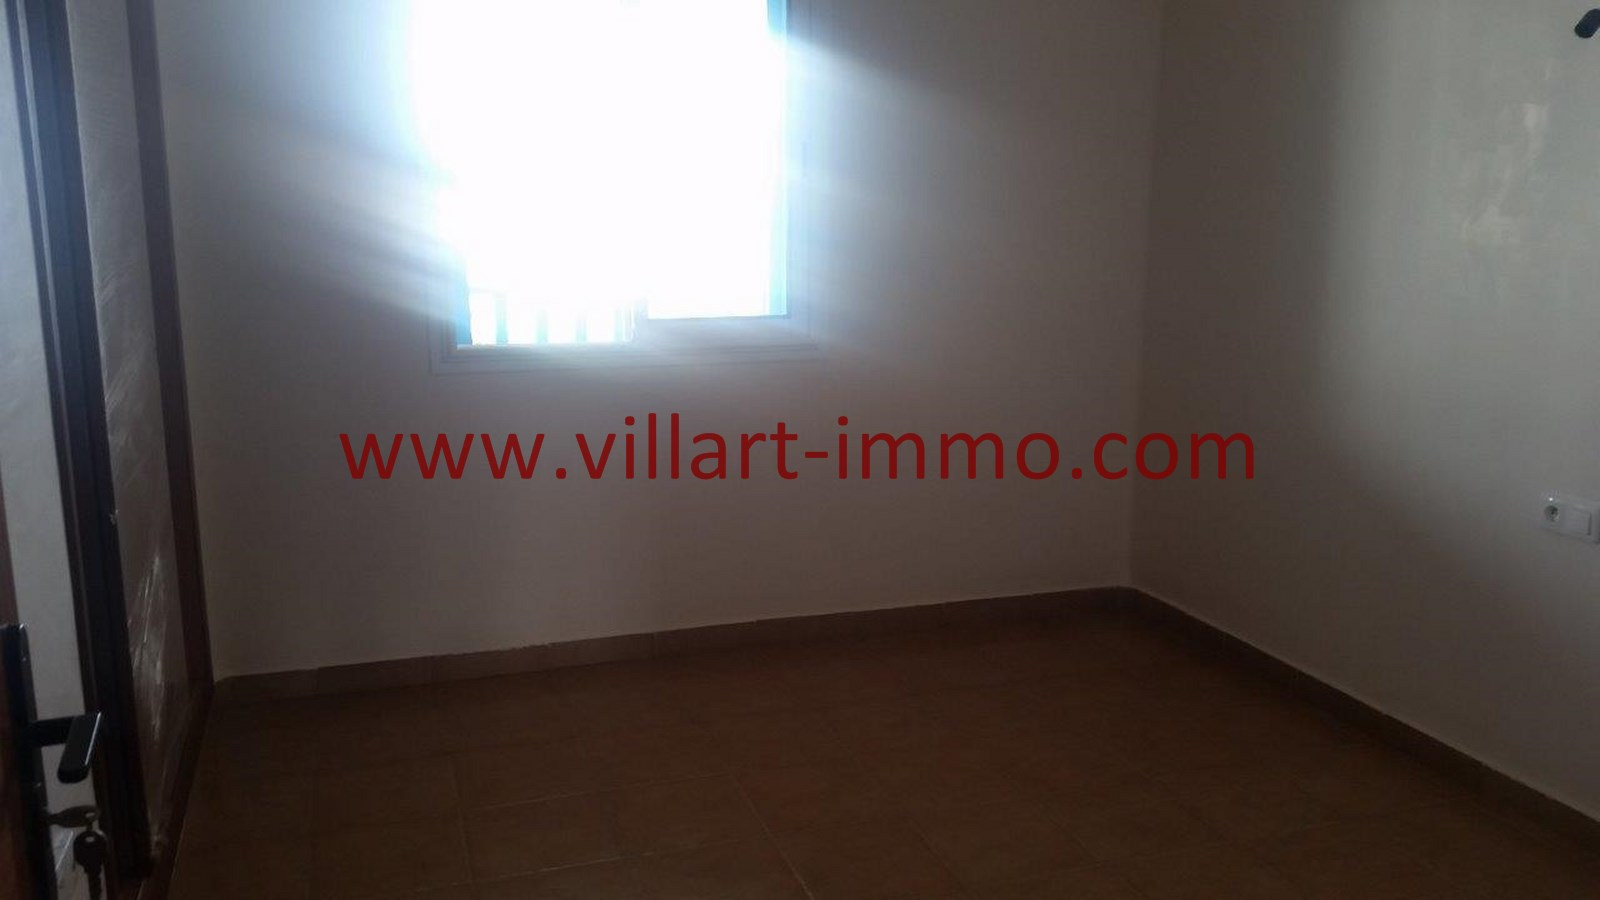 7-vente-appartement-region-tetouan-mdiq-chambre-3-va395-villart-immo